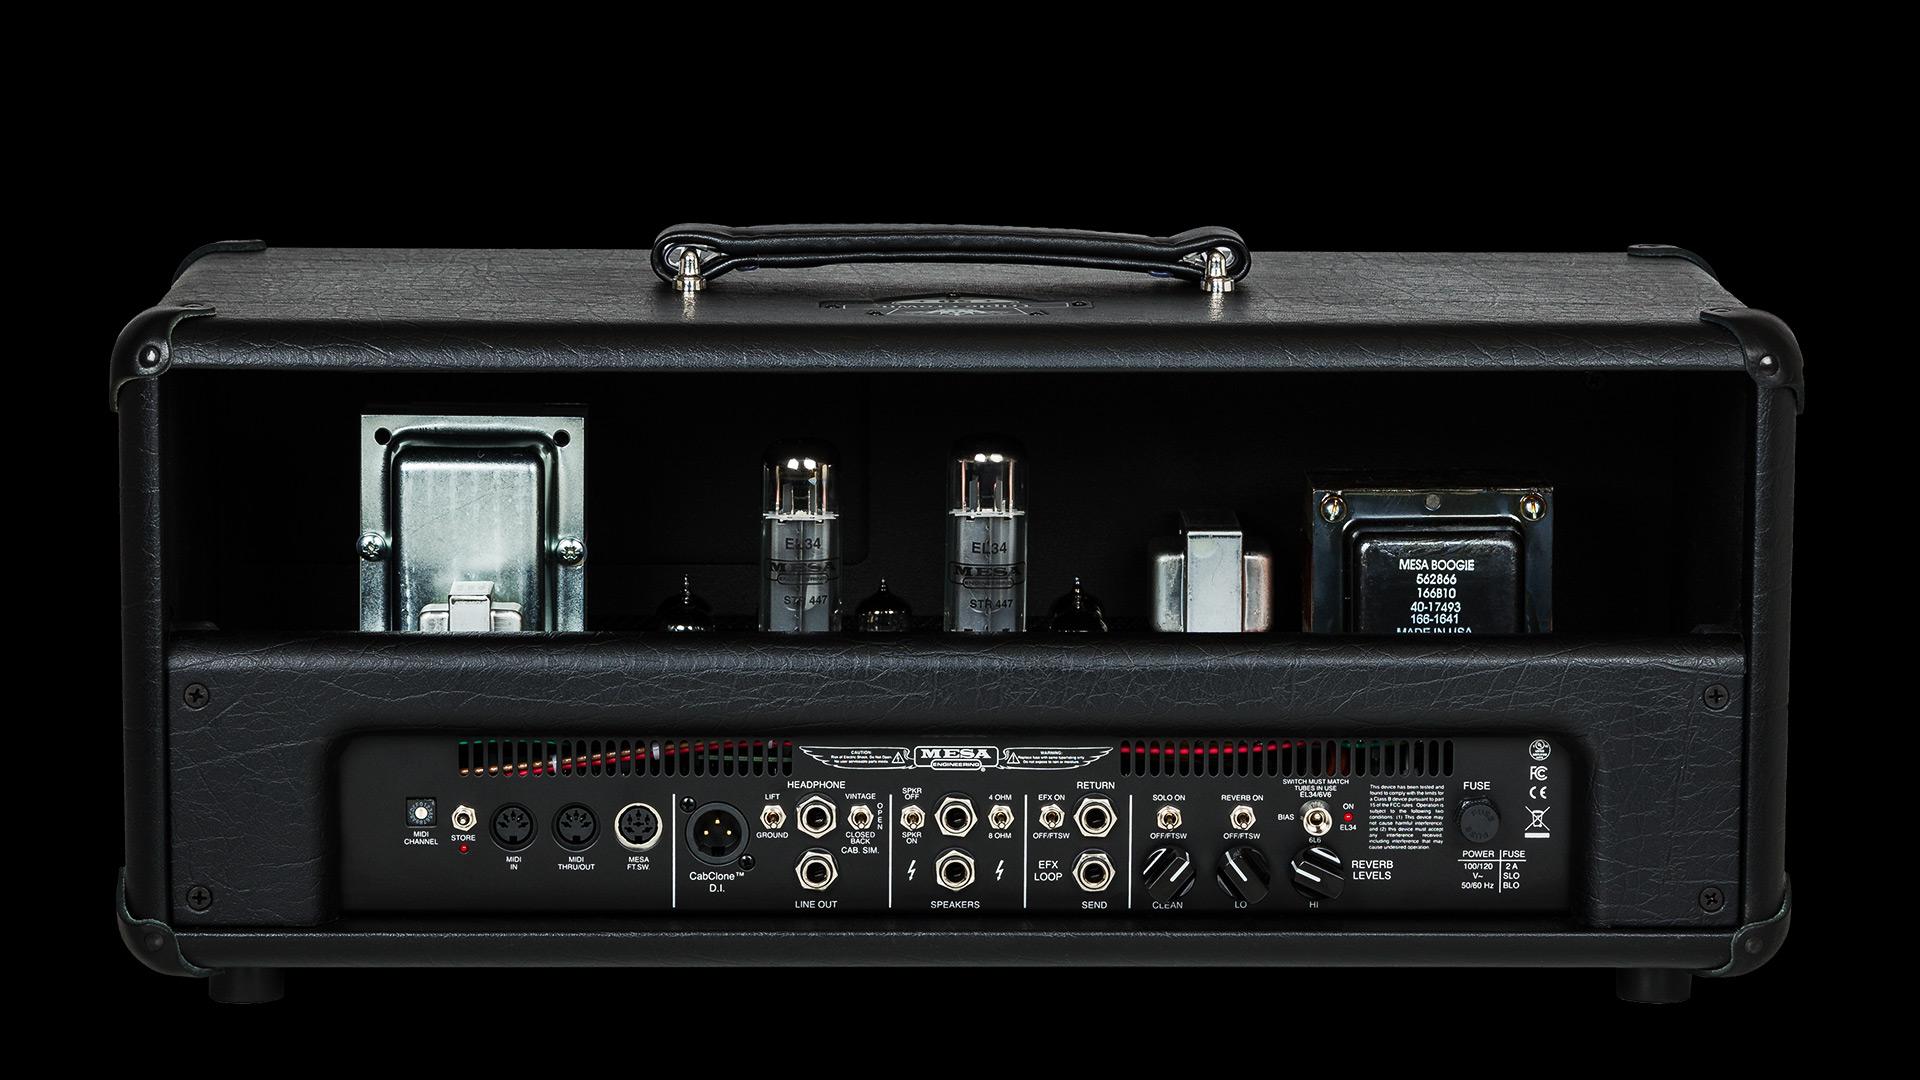 mesa boogie triple crown tc 50 head image 1612469 audiofanzine. Black Bedroom Furniture Sets. Home Design Ideas